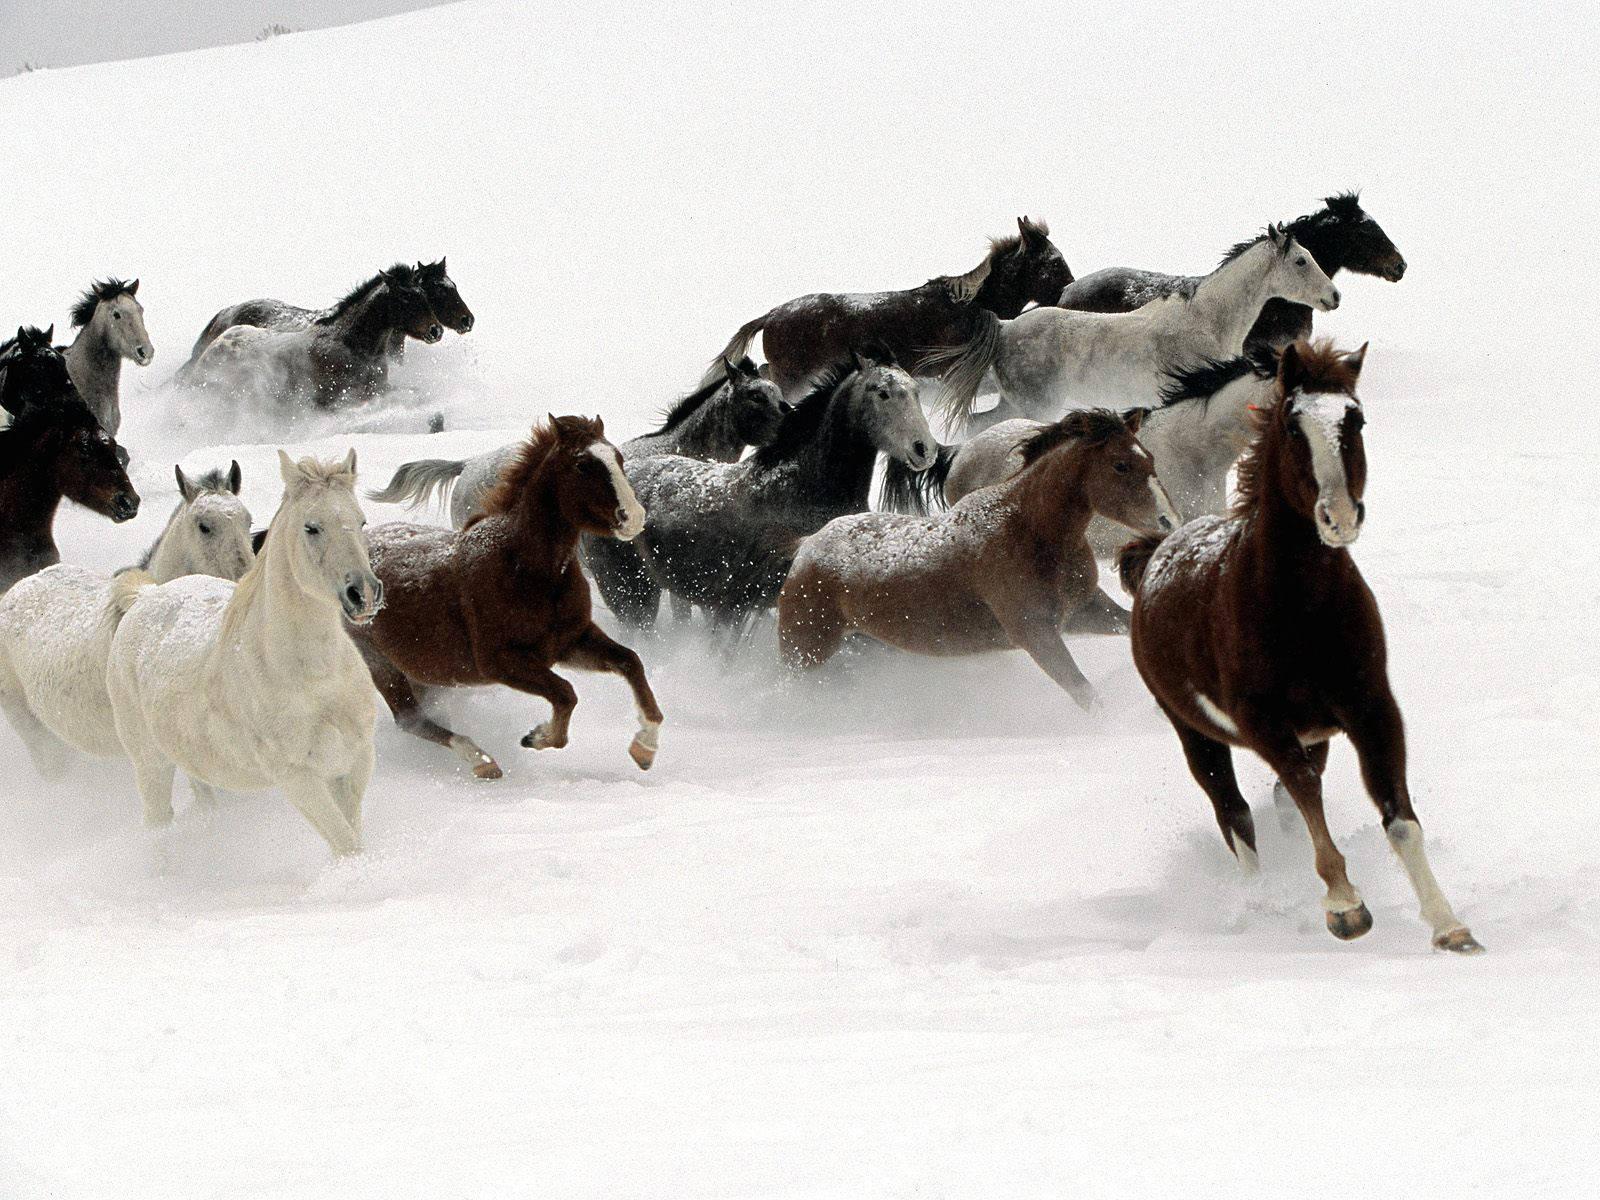 Cool Wallpaper Horse Snow - the-best-top-desktop-horse-wallpapers-29  Trends_100117.jpg